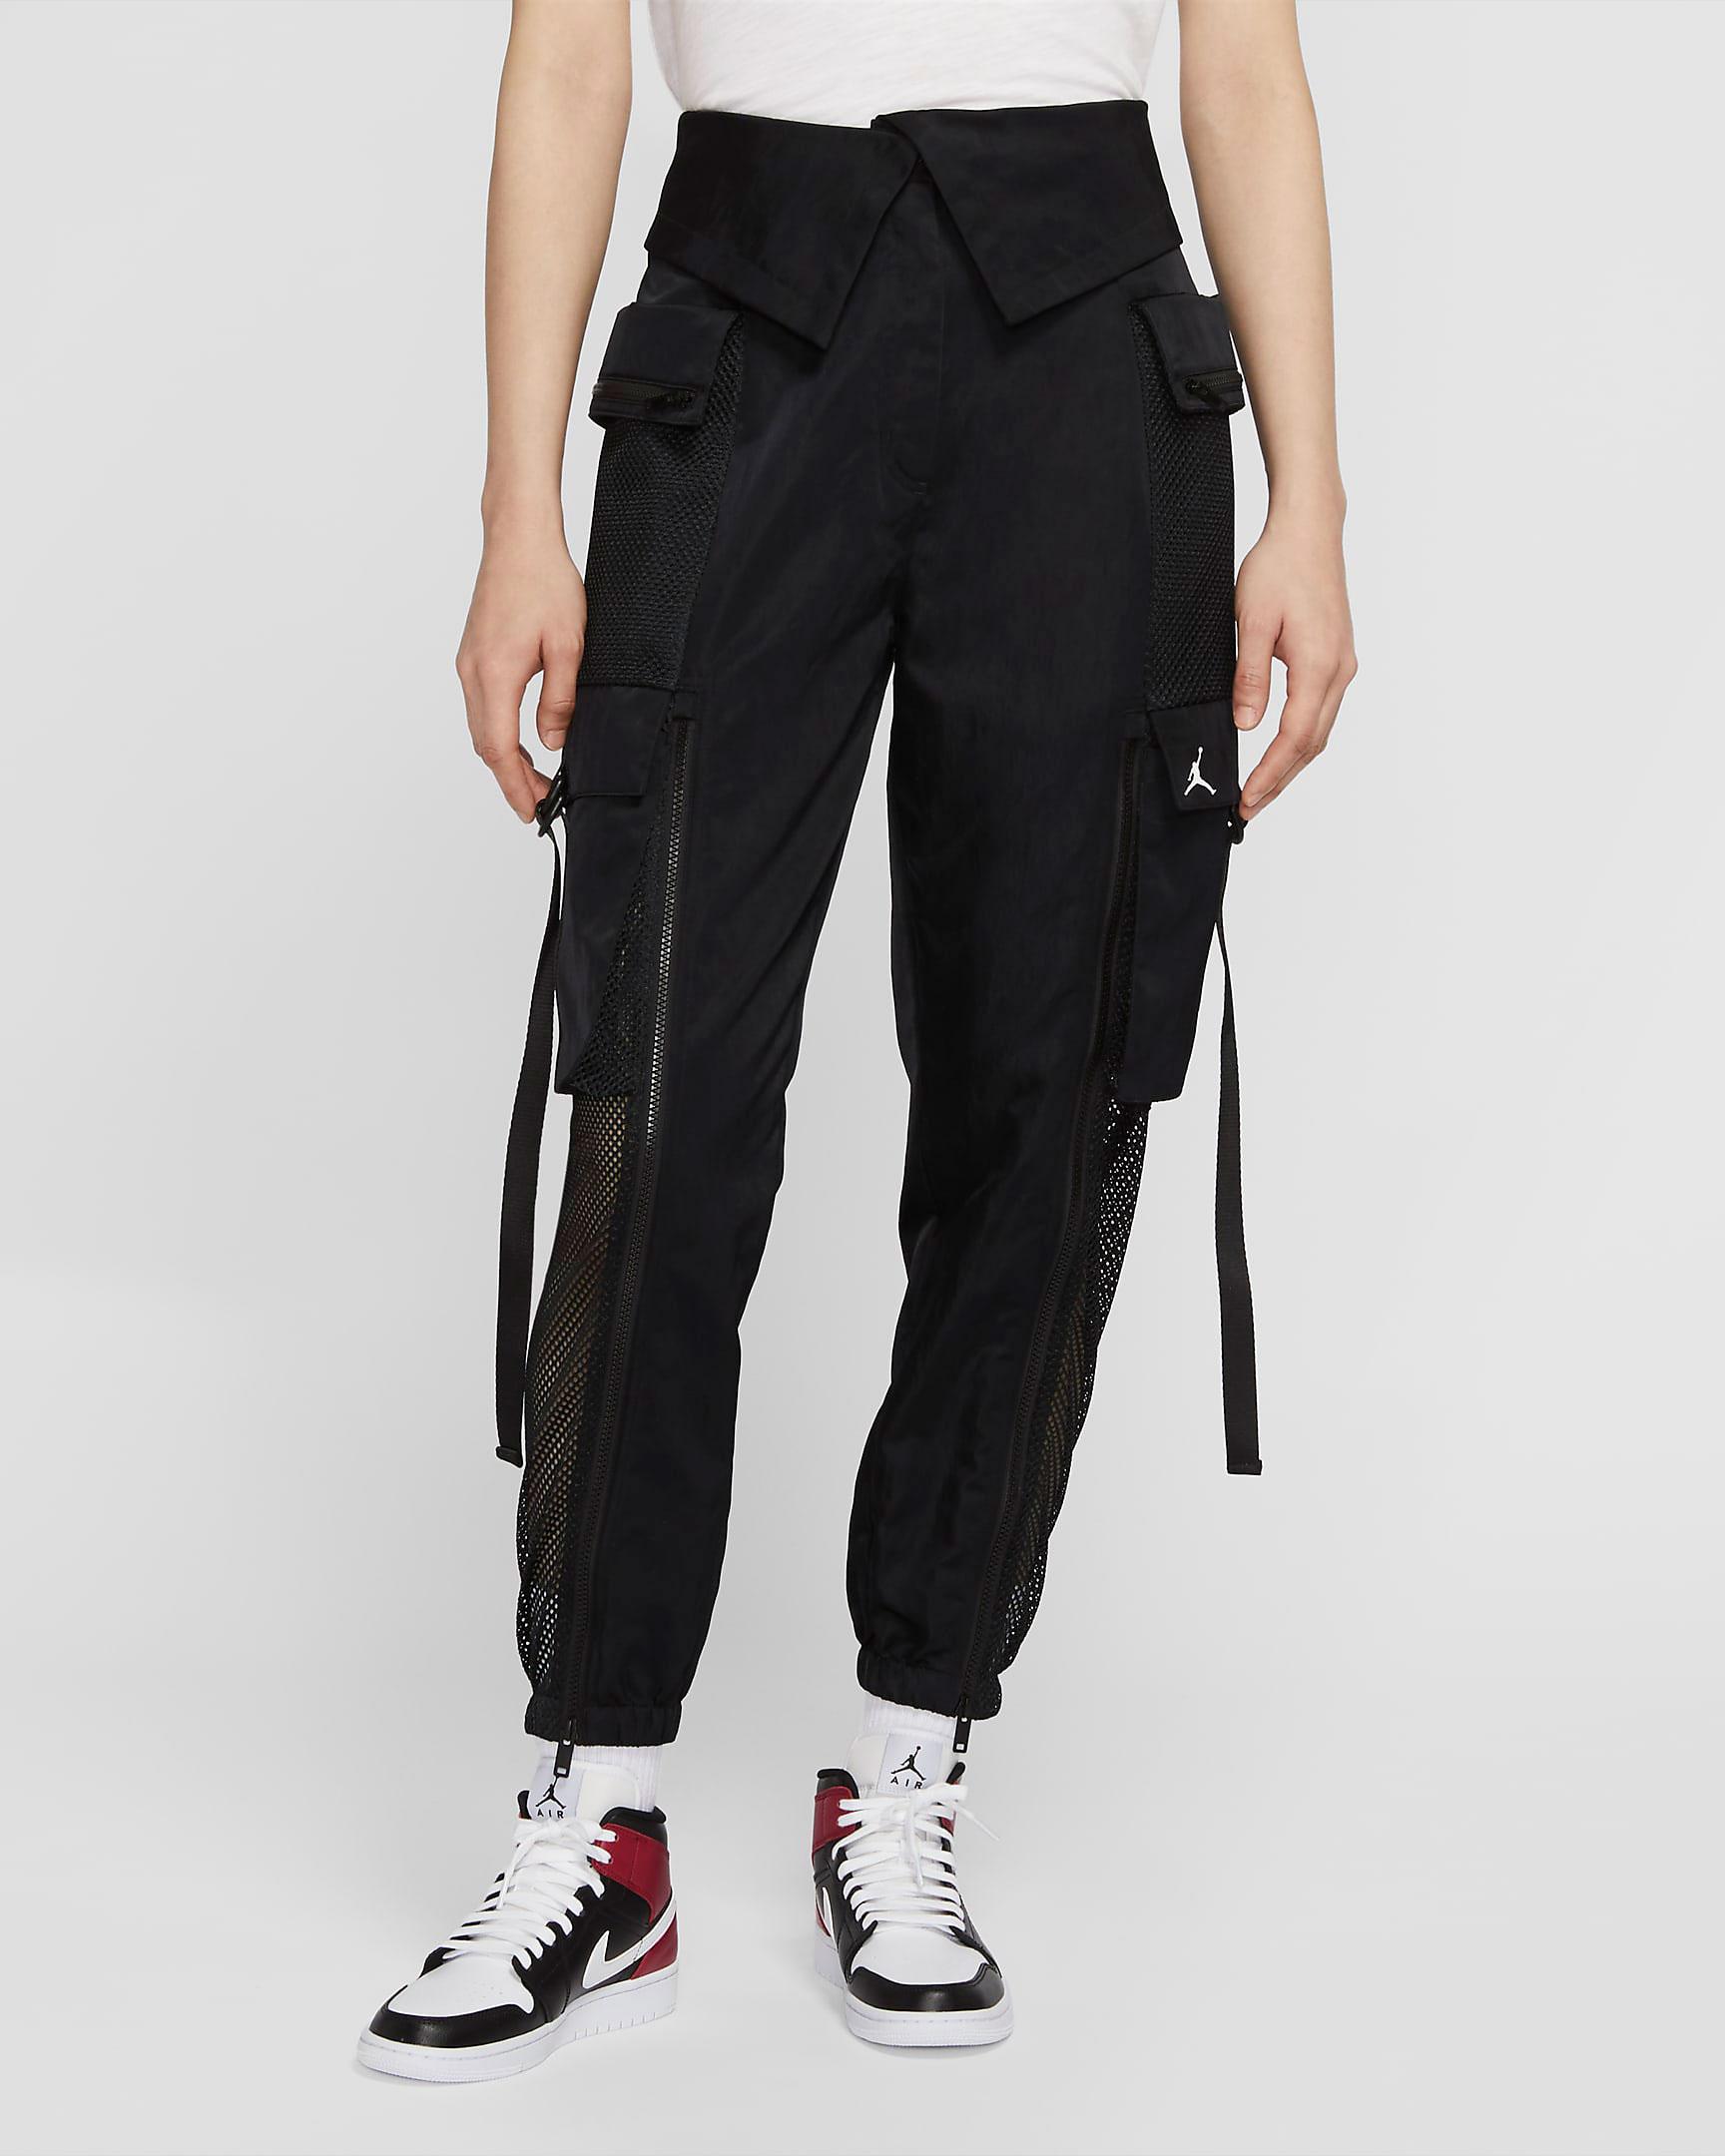 jordan-womens-utility-pants